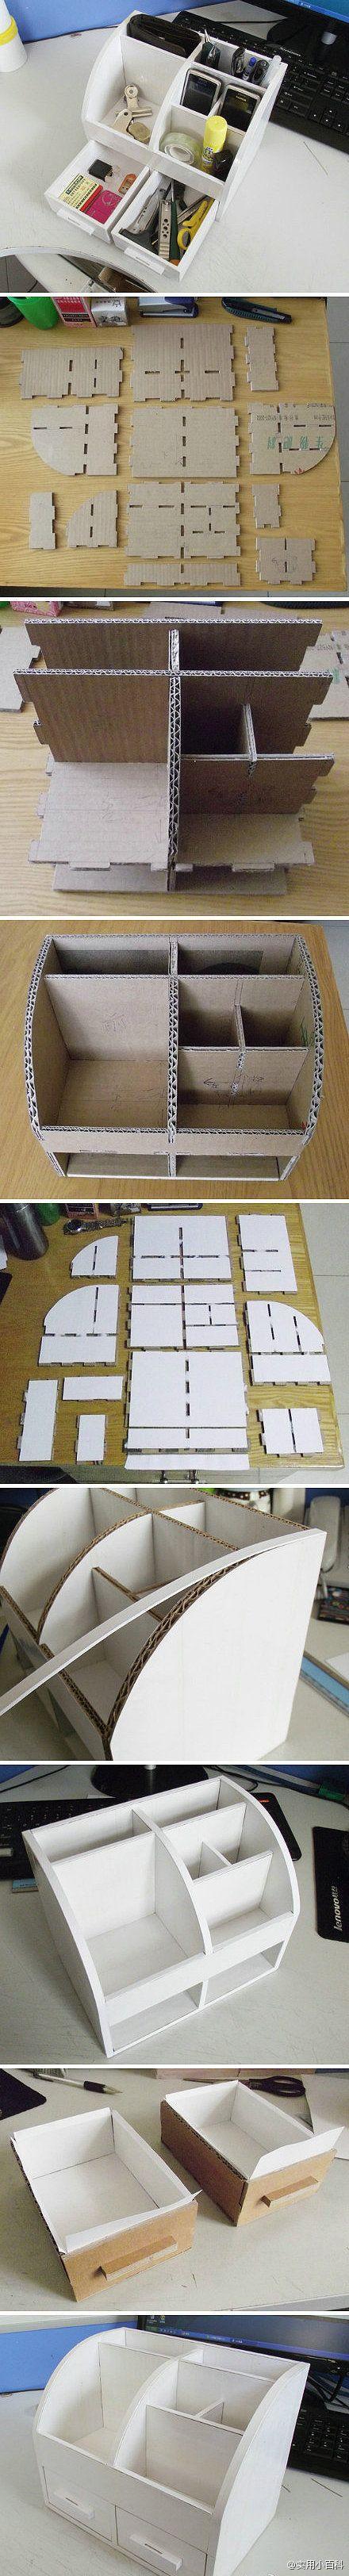 DIY desk organiser